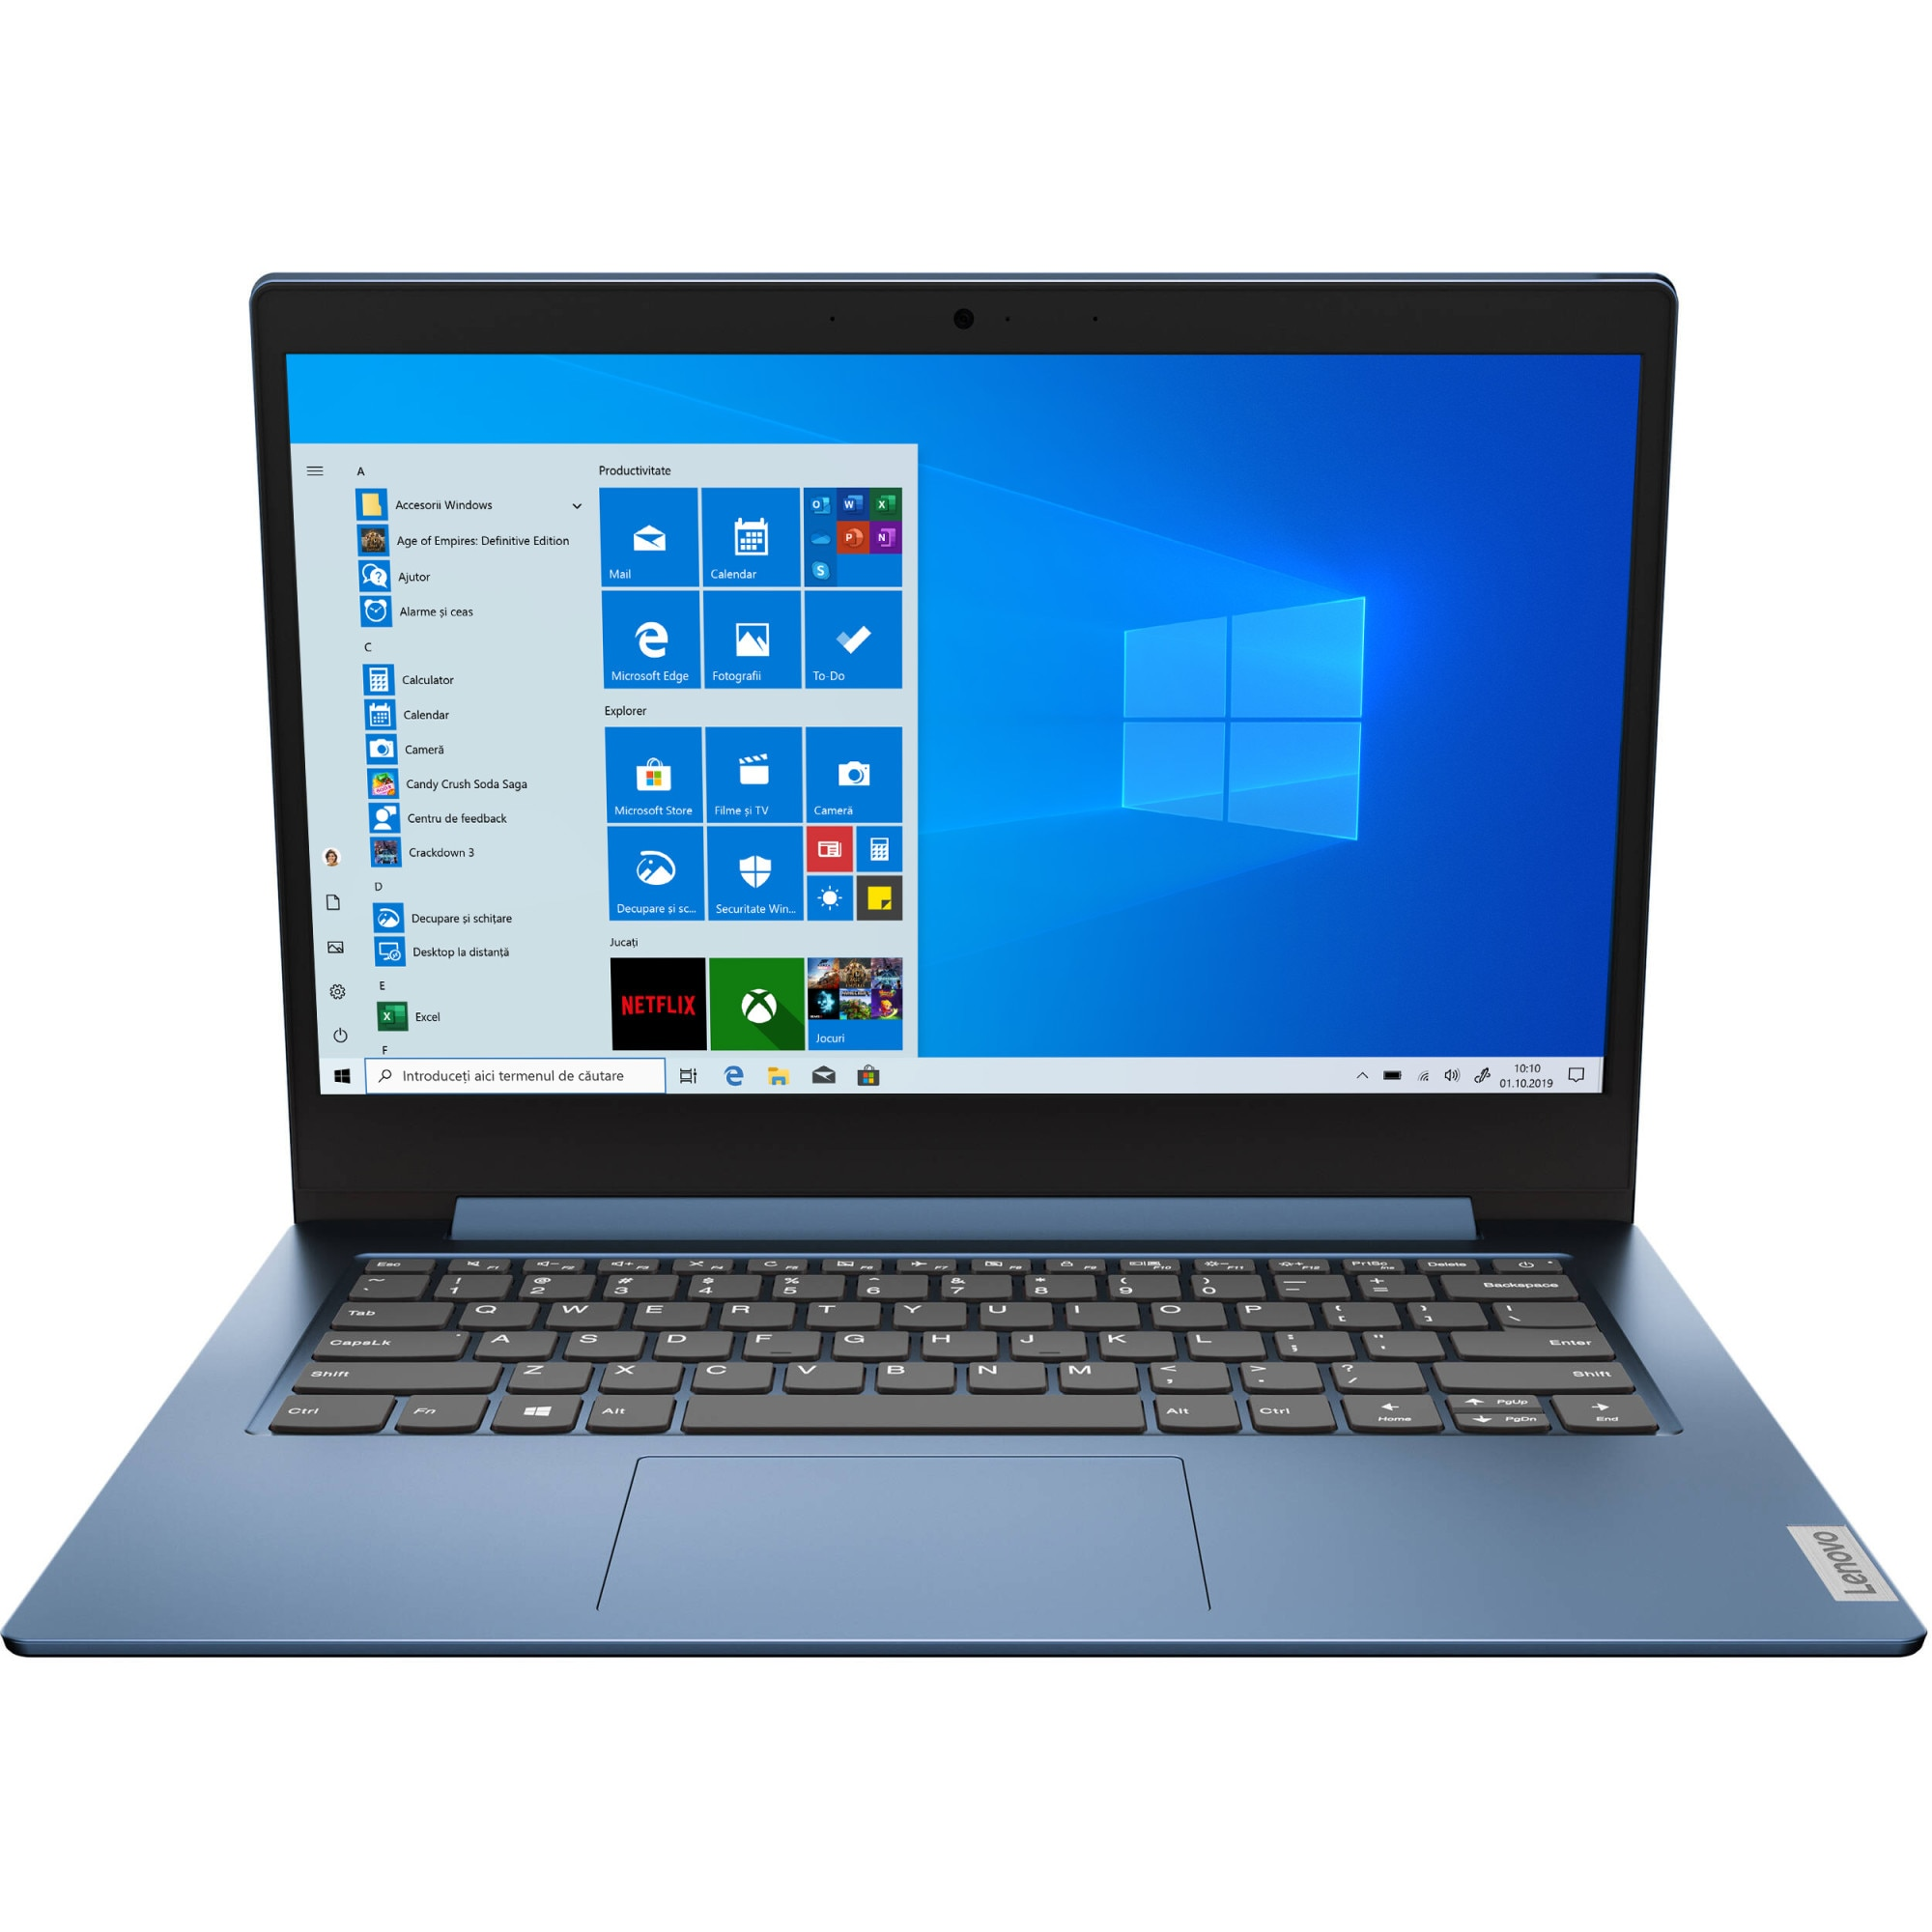 "Fotografie Laptop ultraportabil Lenovo Ideapad Slim 1-14AST-05 cu procesor AMD A4-9120e pana 2.20 GHz, 14"", Full HD, 4GB, 64GB eMMC, AMD Radeon R3 Graphics, Windows 10 Home S, Ice Blue"